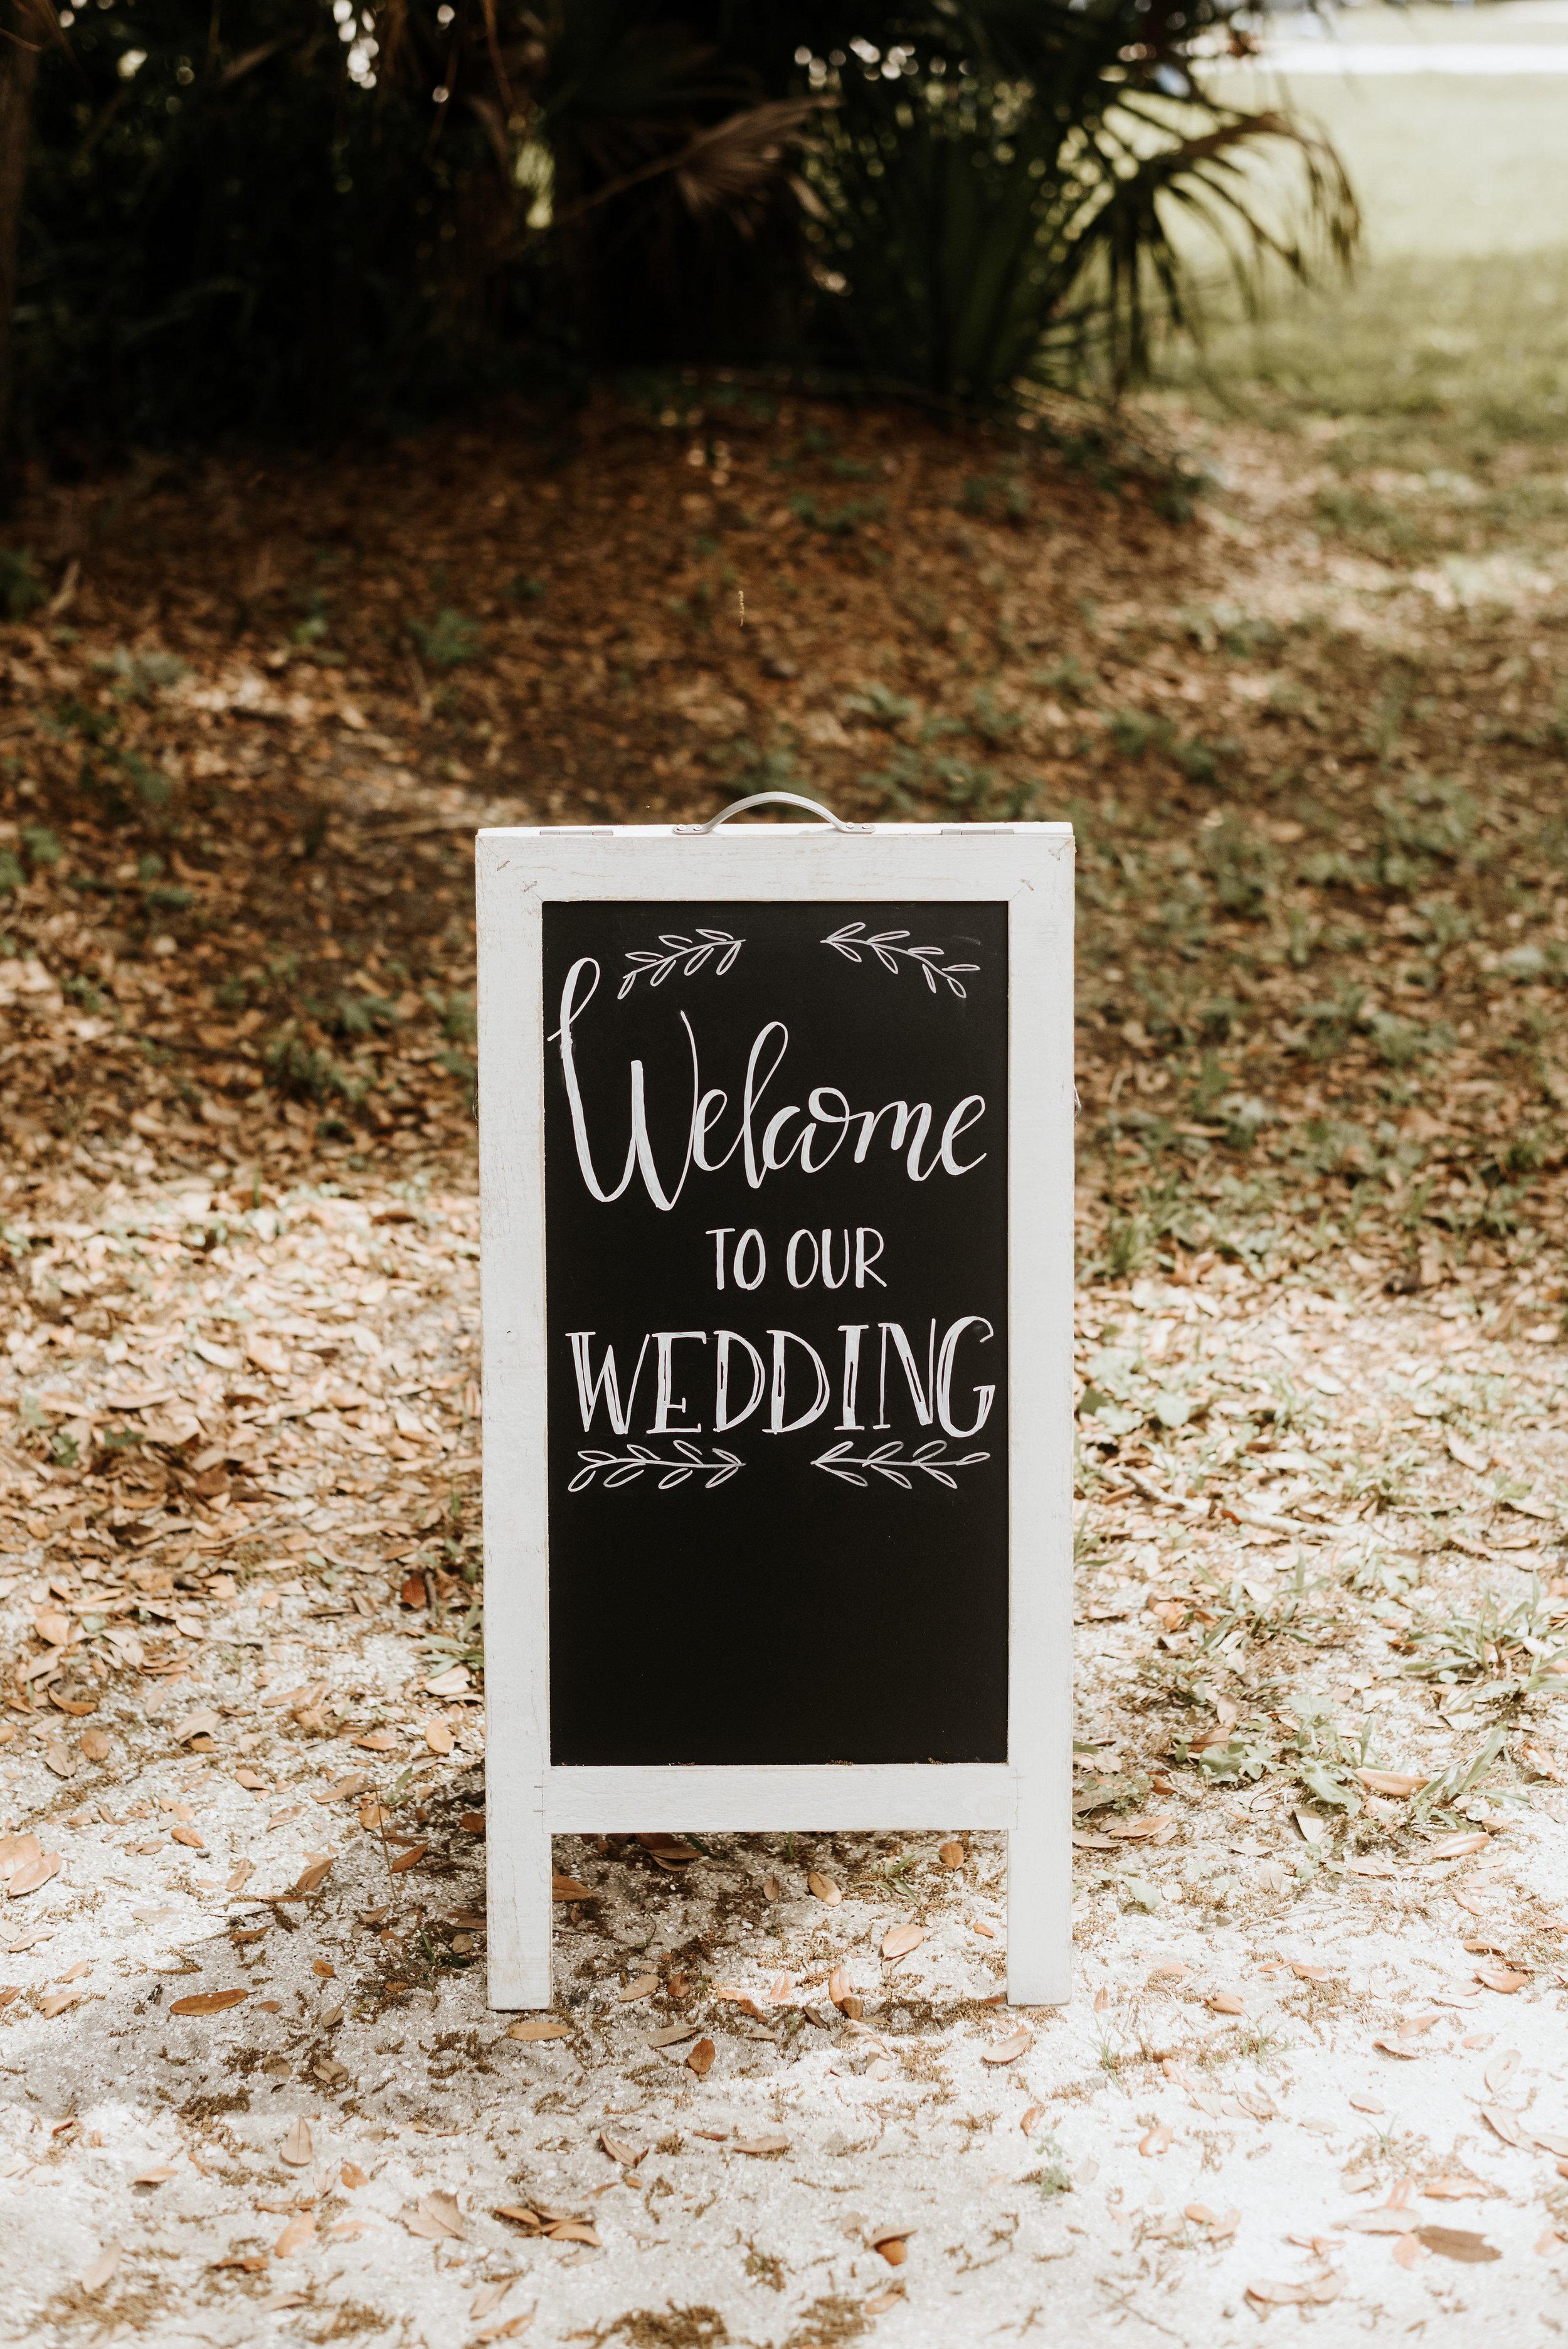 Mikenzi_Brad_Wedding_The_Delamater_House_New_Smyrna_Beach_Florida_Photography_by_V_4232.jpg